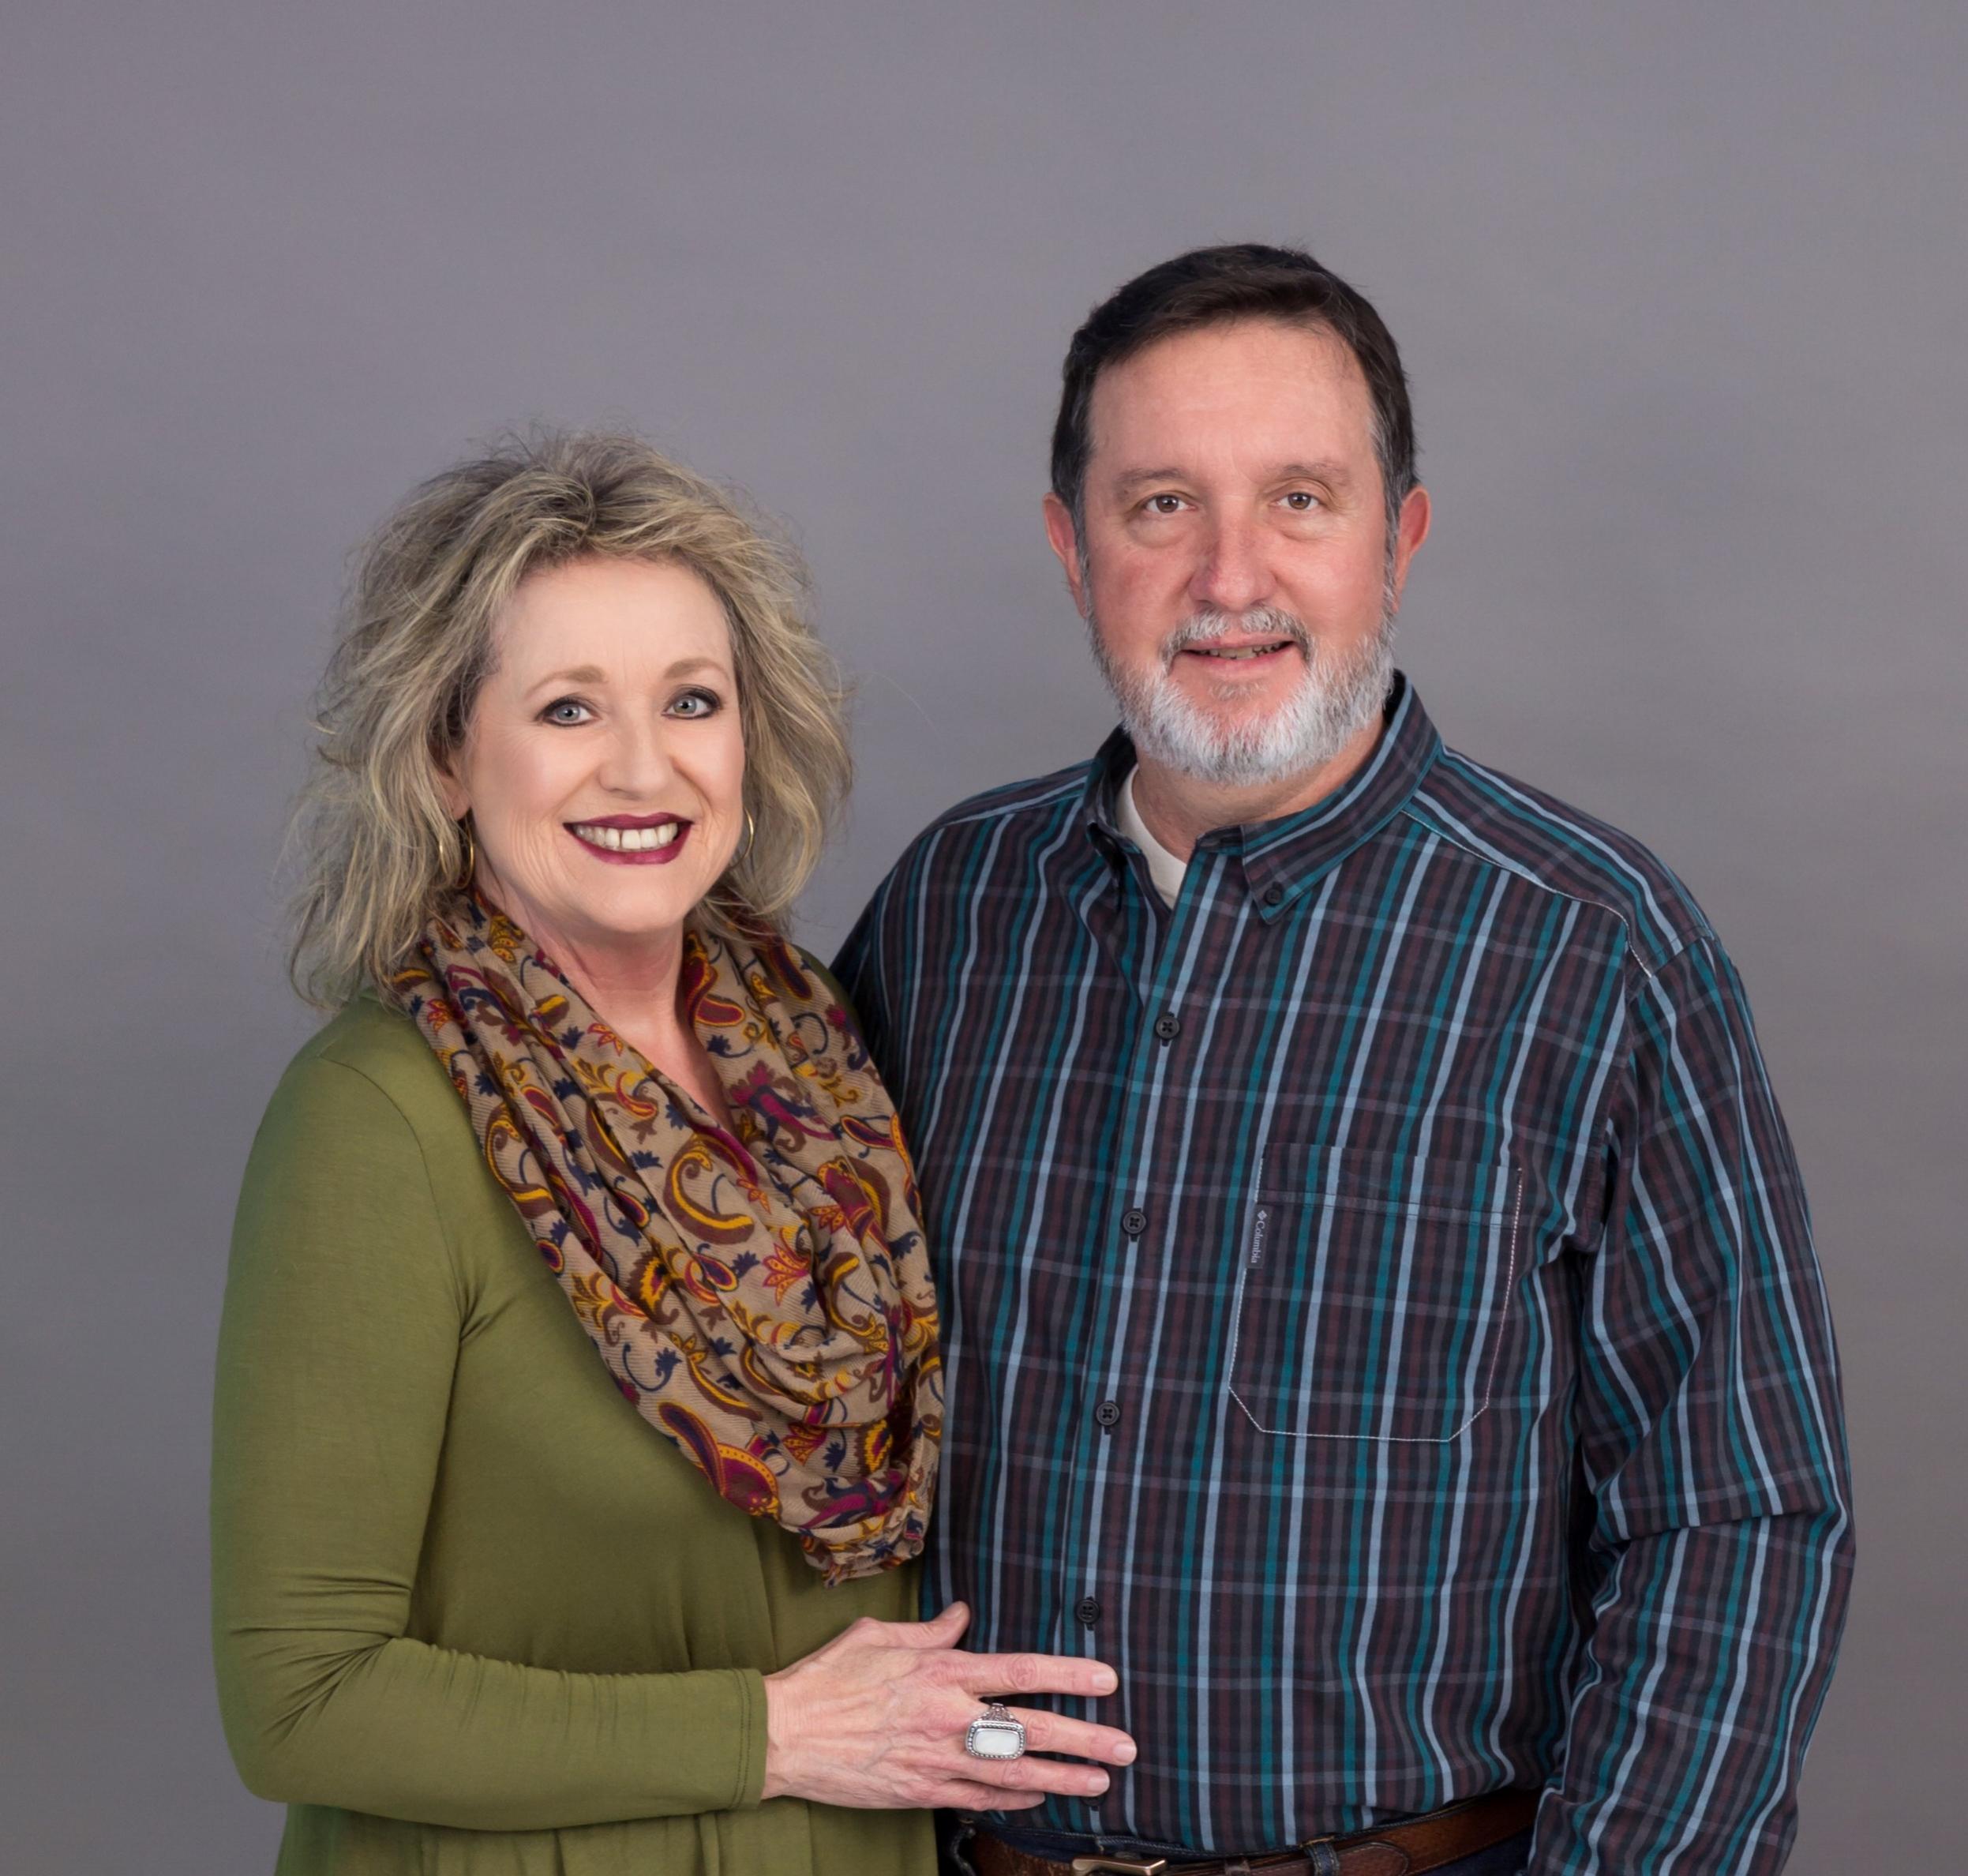 Morris & Trisha Hicks - Morris & Trisha are both natives of DeKalb County. They faithfully serve as FCC's founding Lead Pastors.